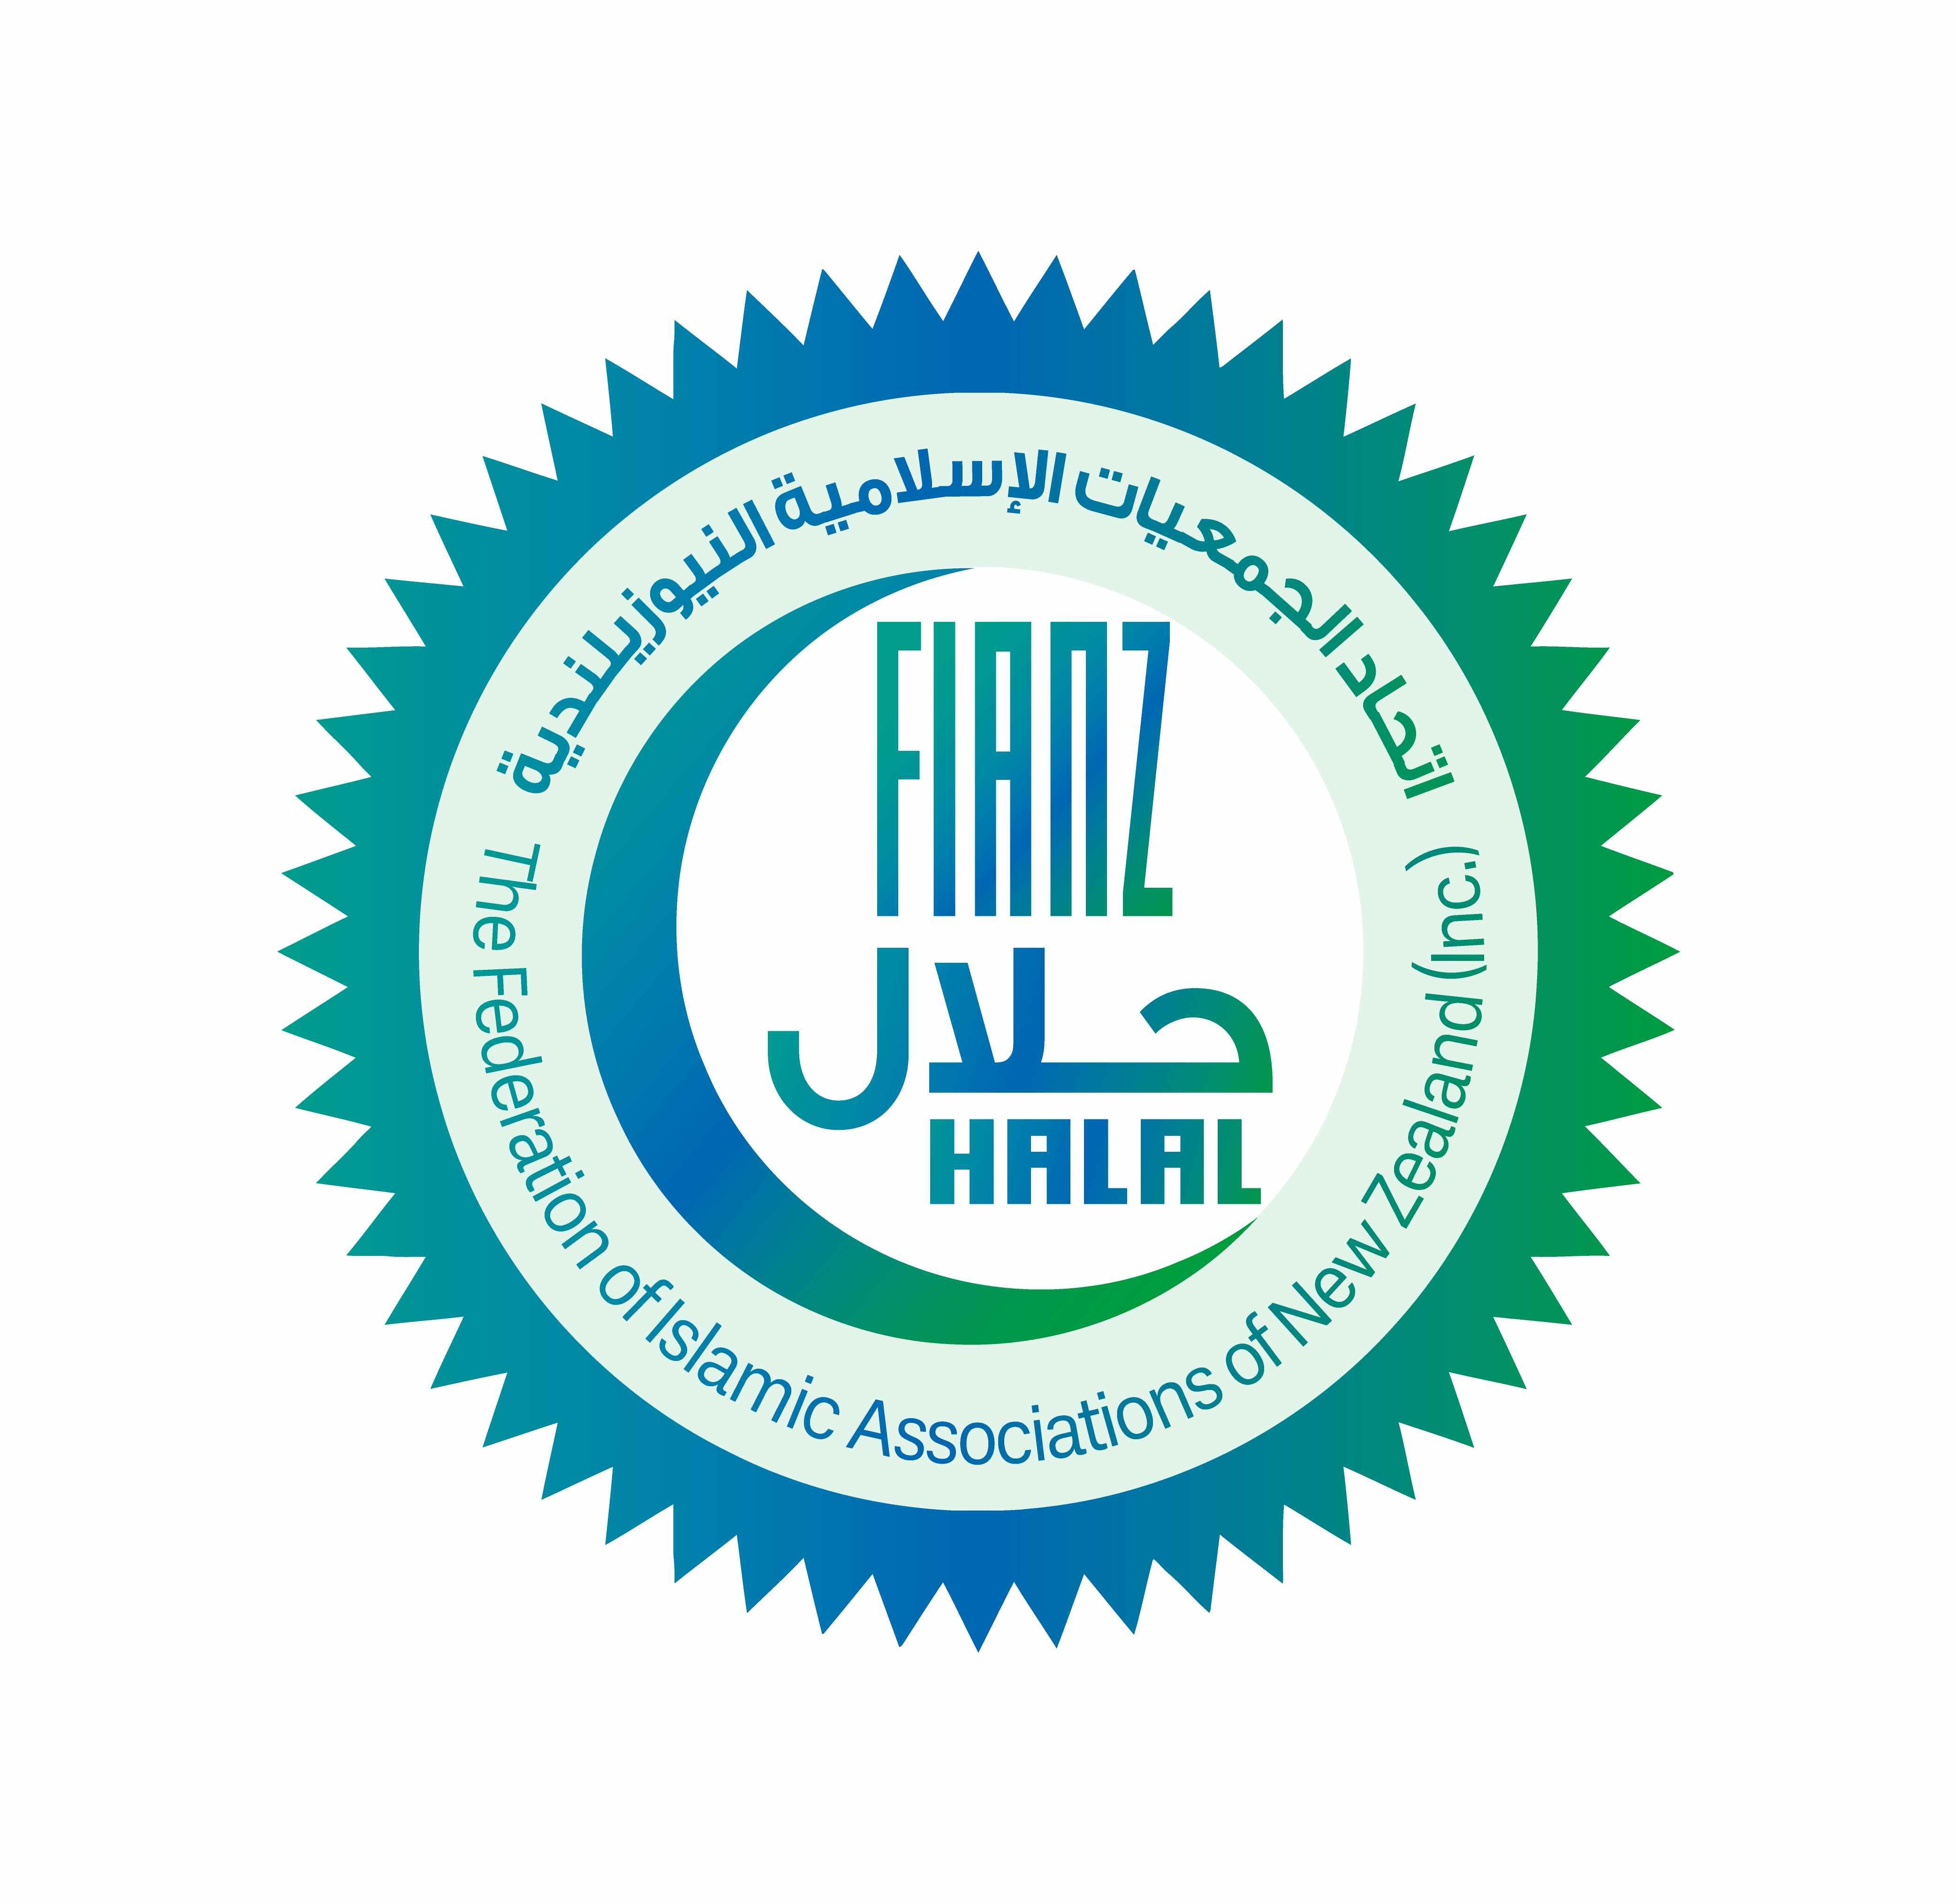 Fianz-HALAL-LogoWM2CjGpjtFPLZ